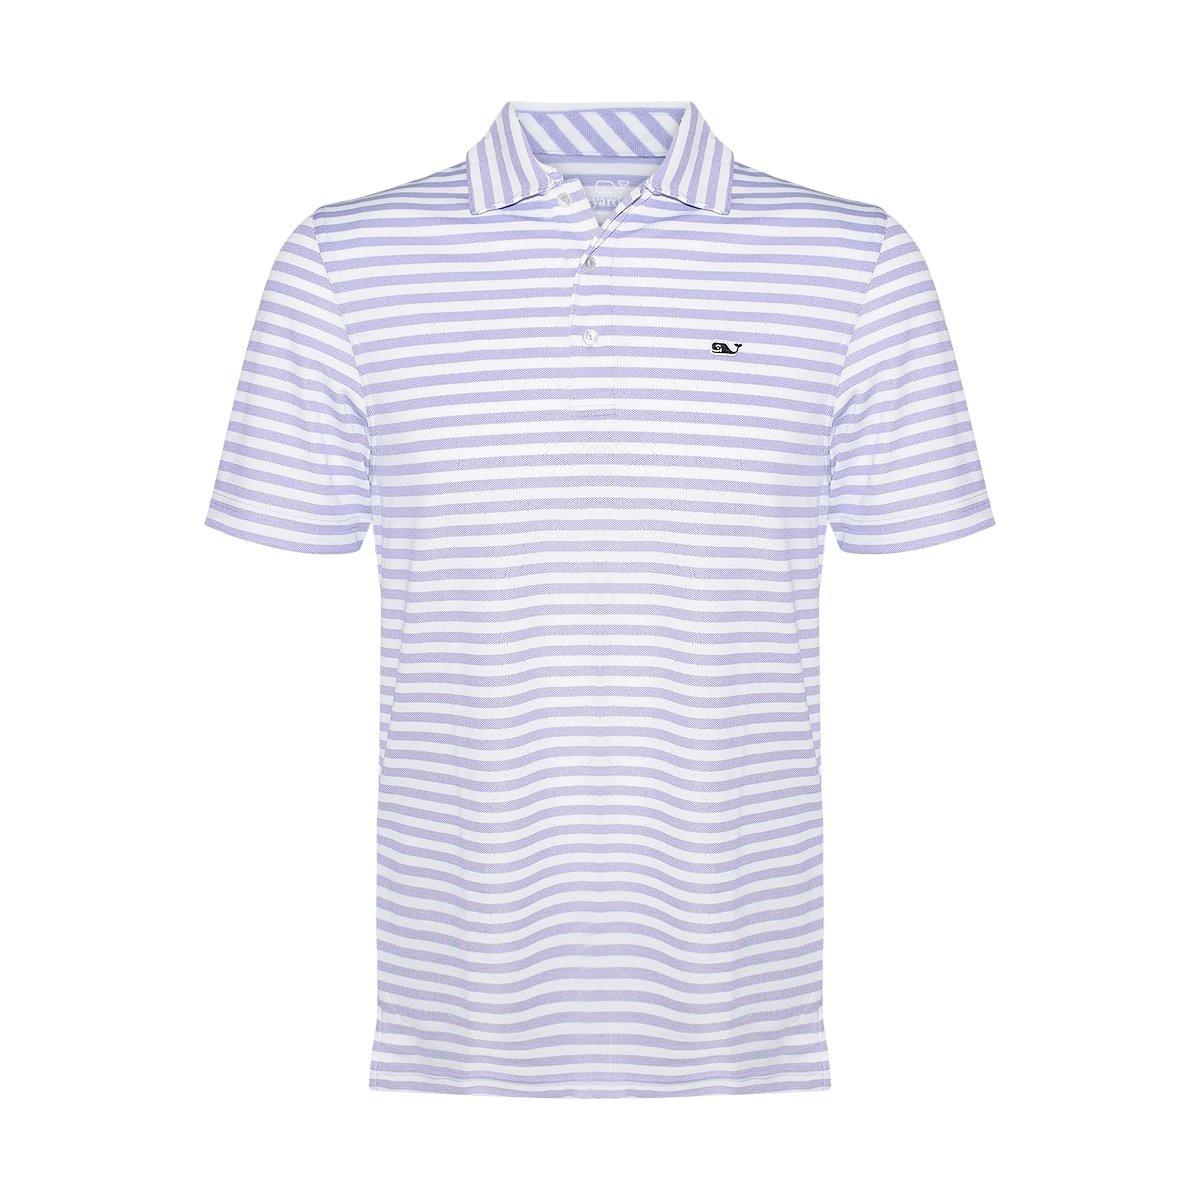 d0cbbfe7 Vineyard Vines Men's Performance Pique Polo Shirt (Thistle, Small) at  Amazon Men's Clothing store: